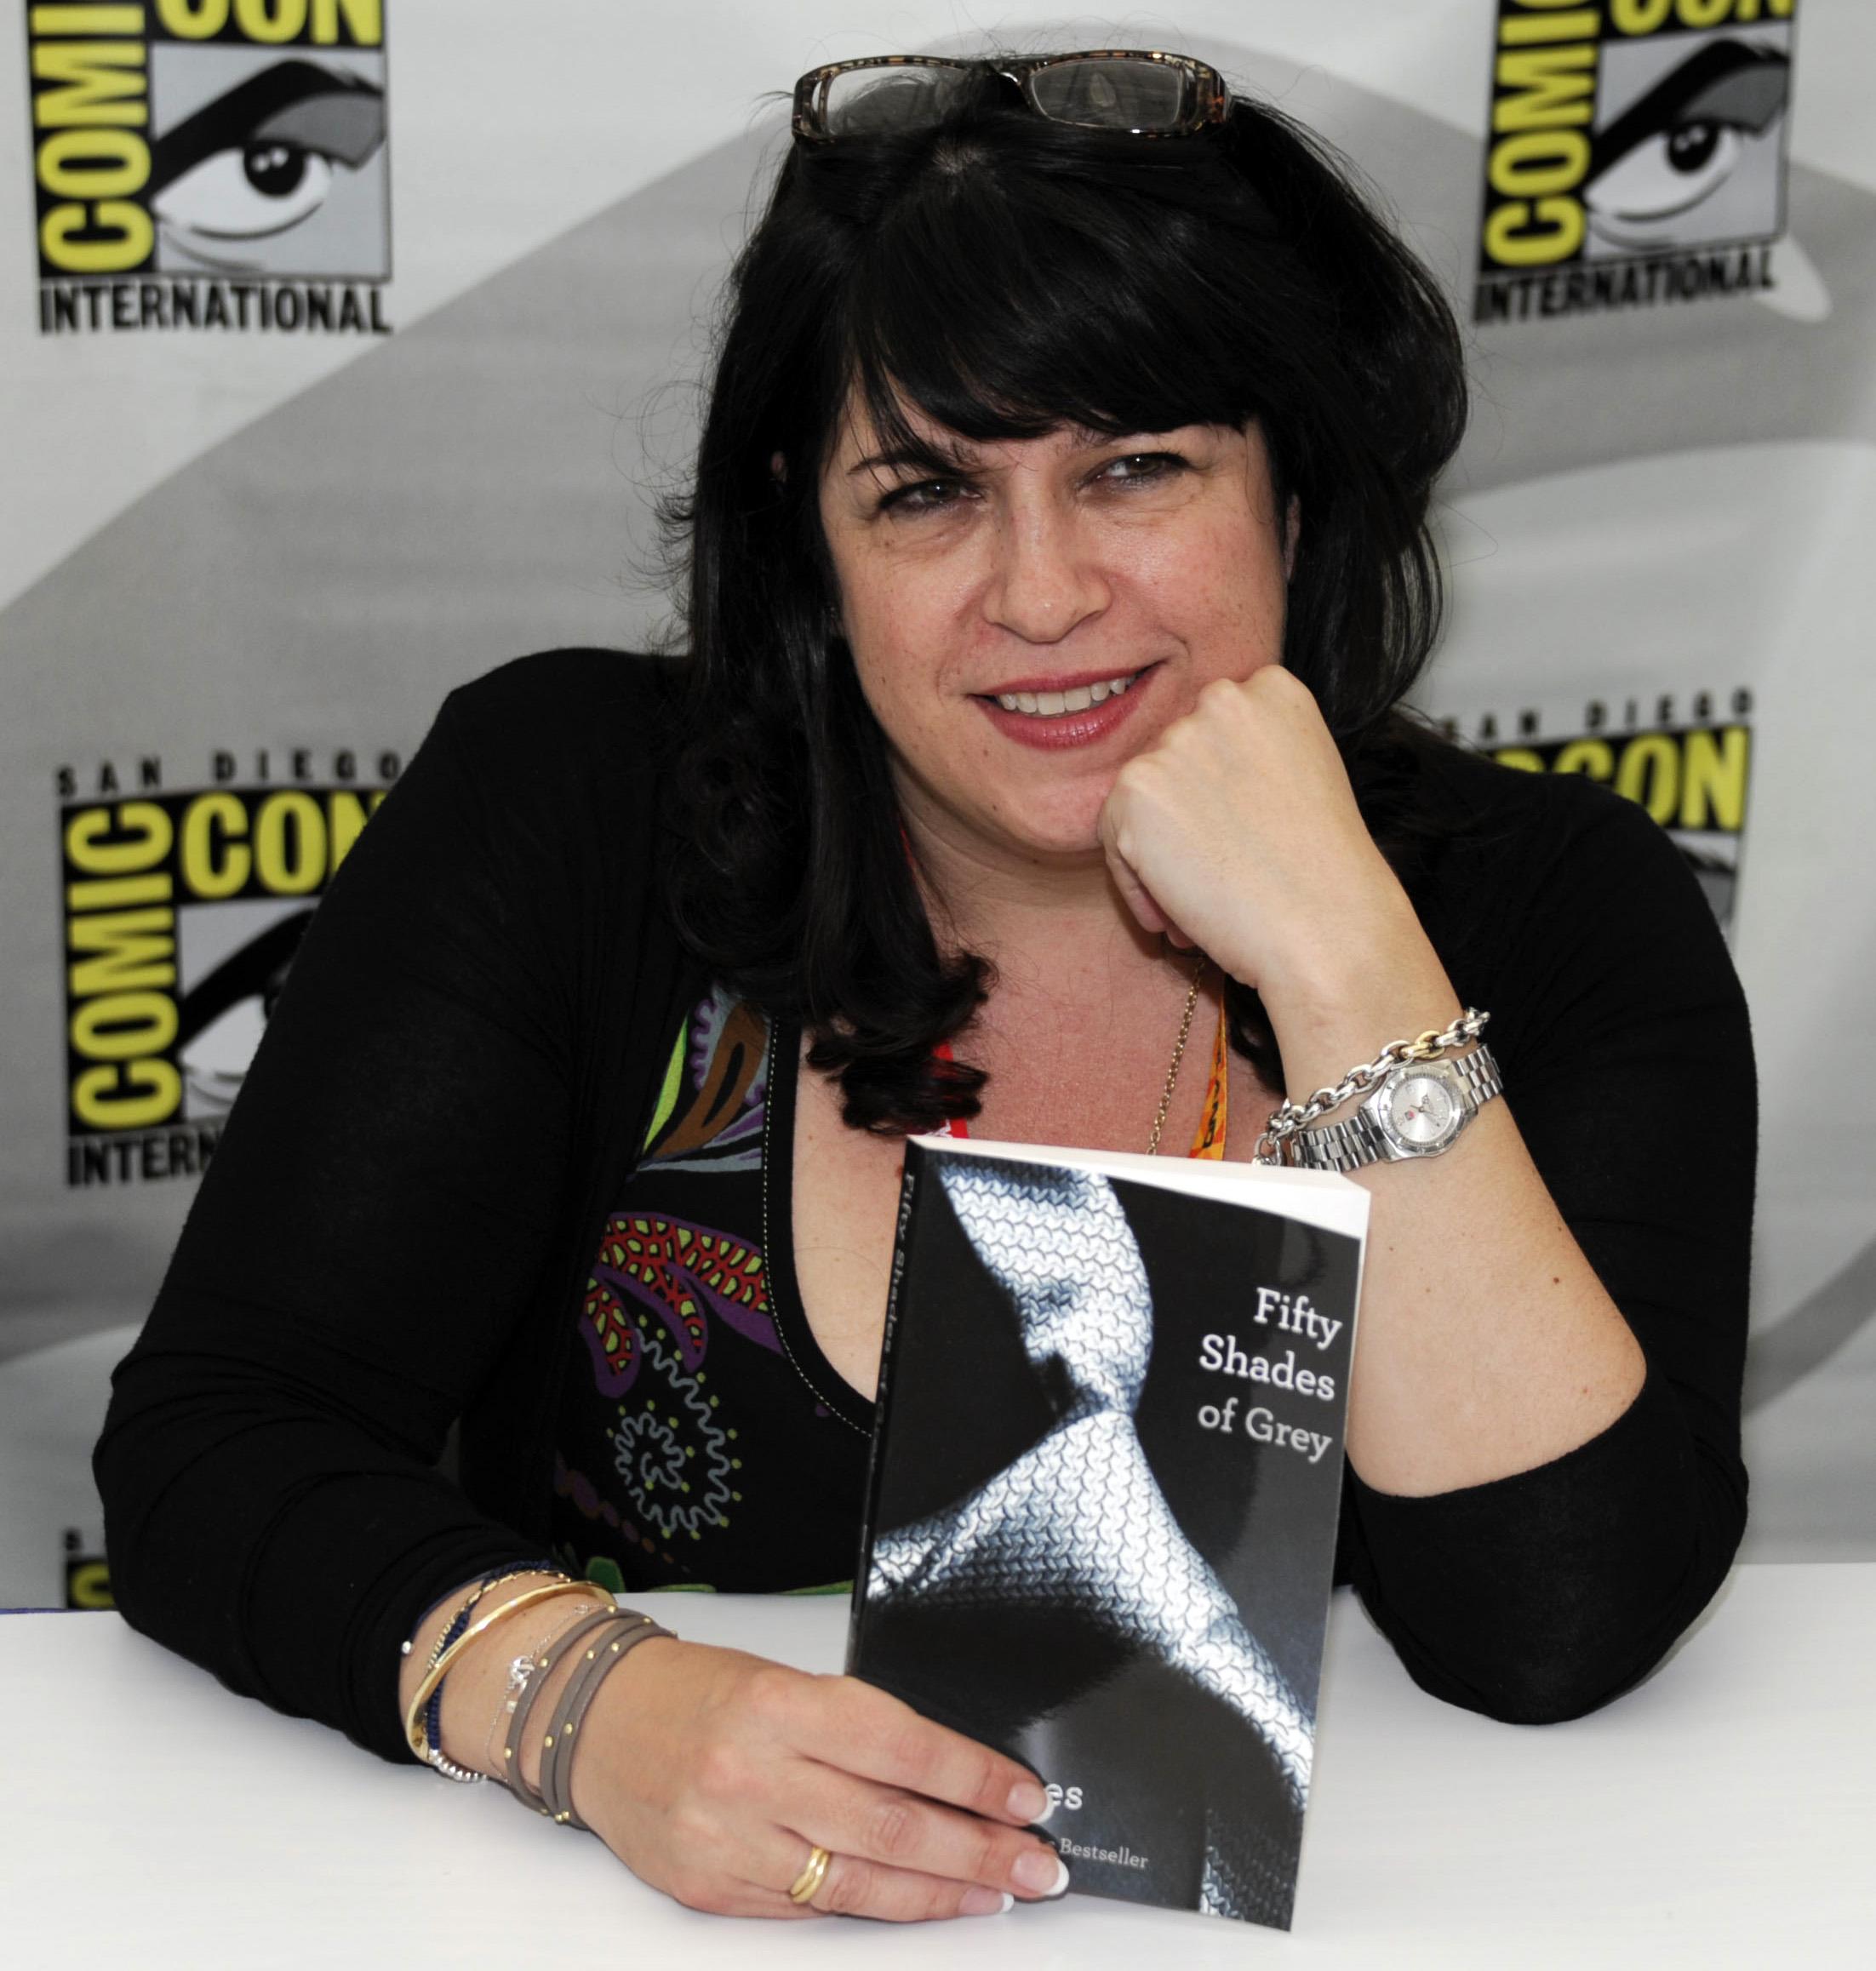 Fifty Shades of Grey author El James to write 'less raunchy' novel under nom de plume